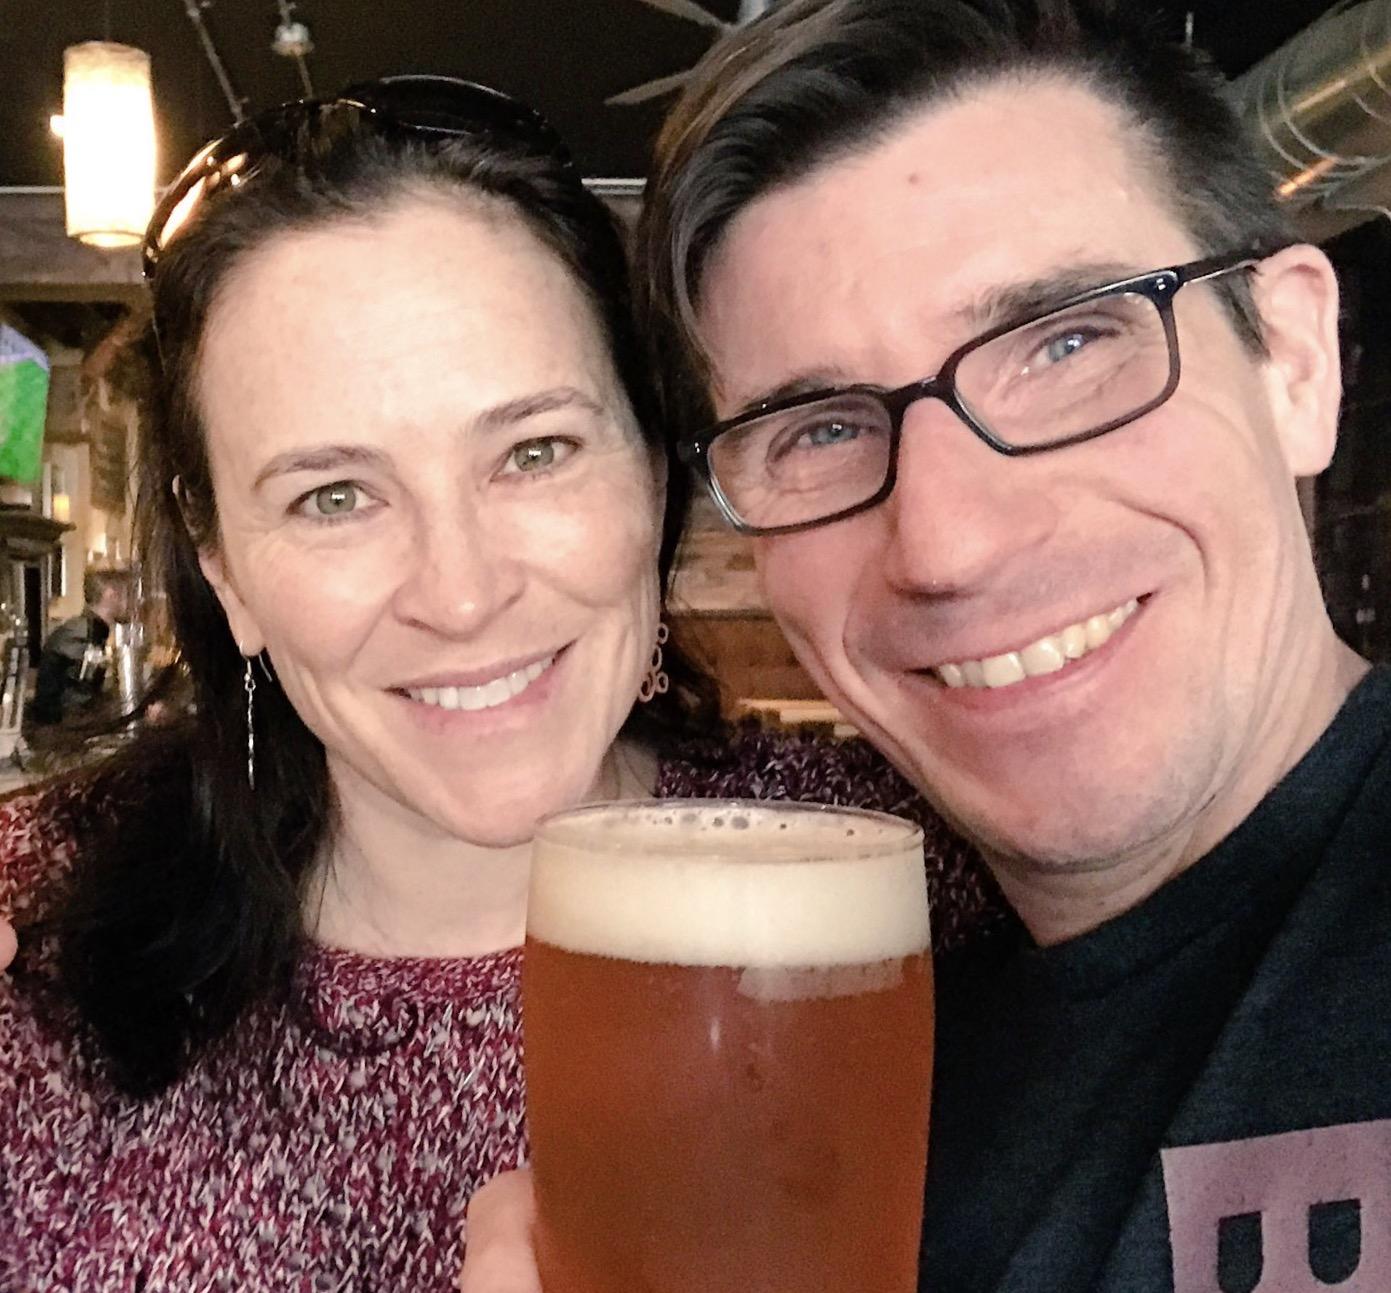 Beer snob dating